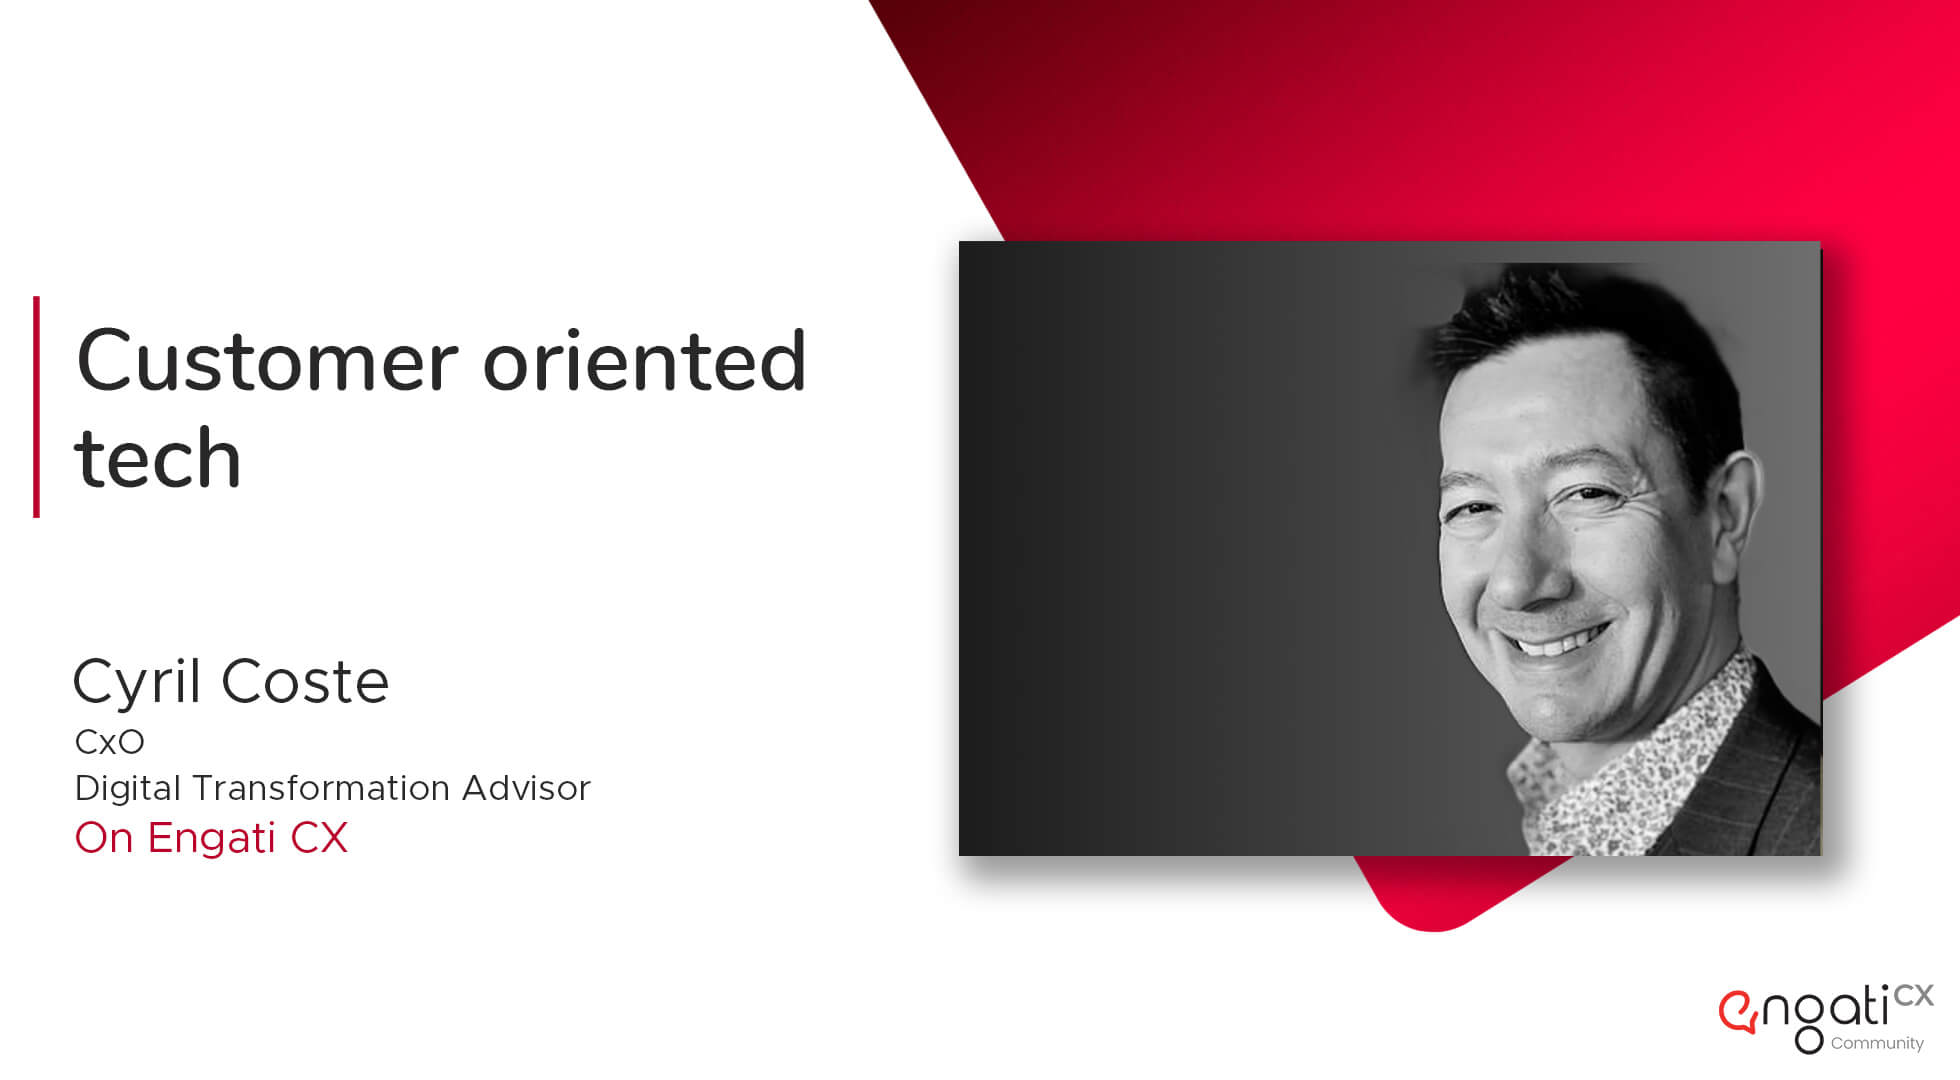 Customer oriented tech | Cyril Coste | Engati CX